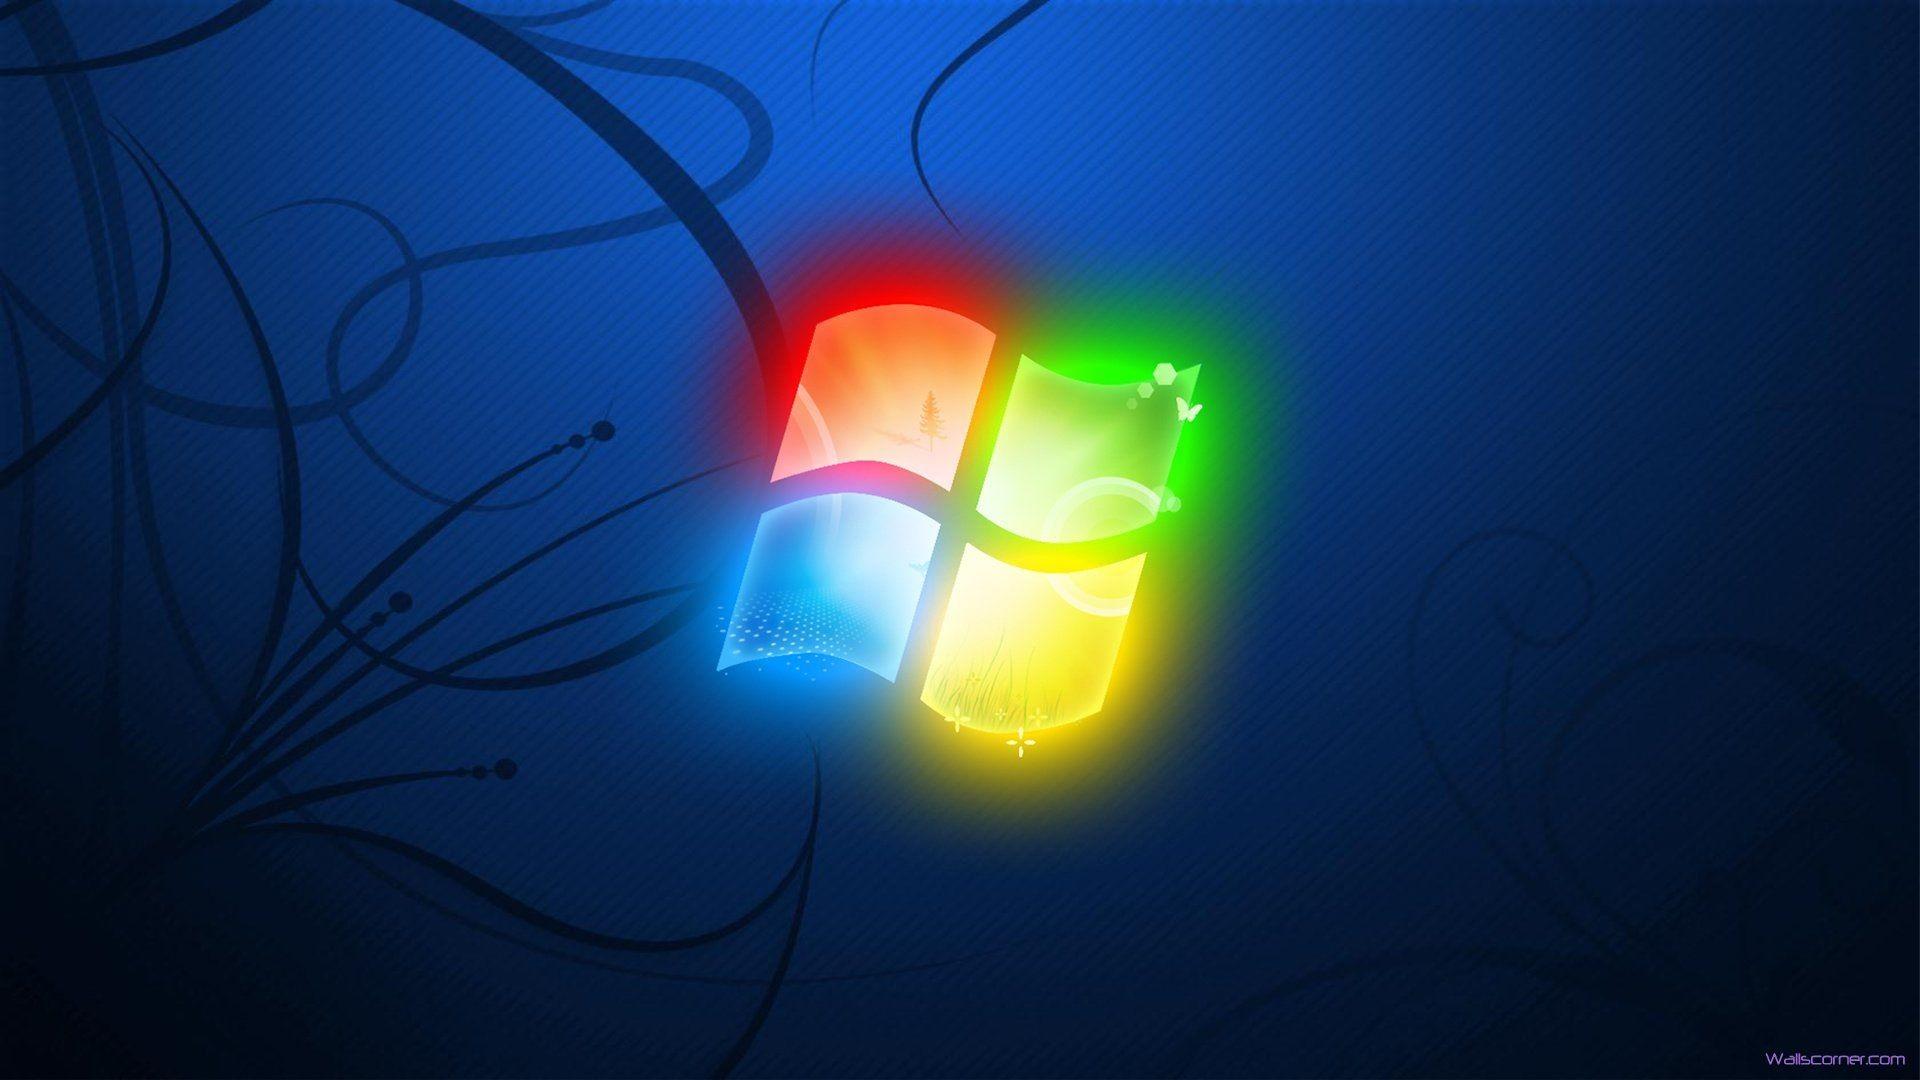 Classic Windows Desktop Wallpaper